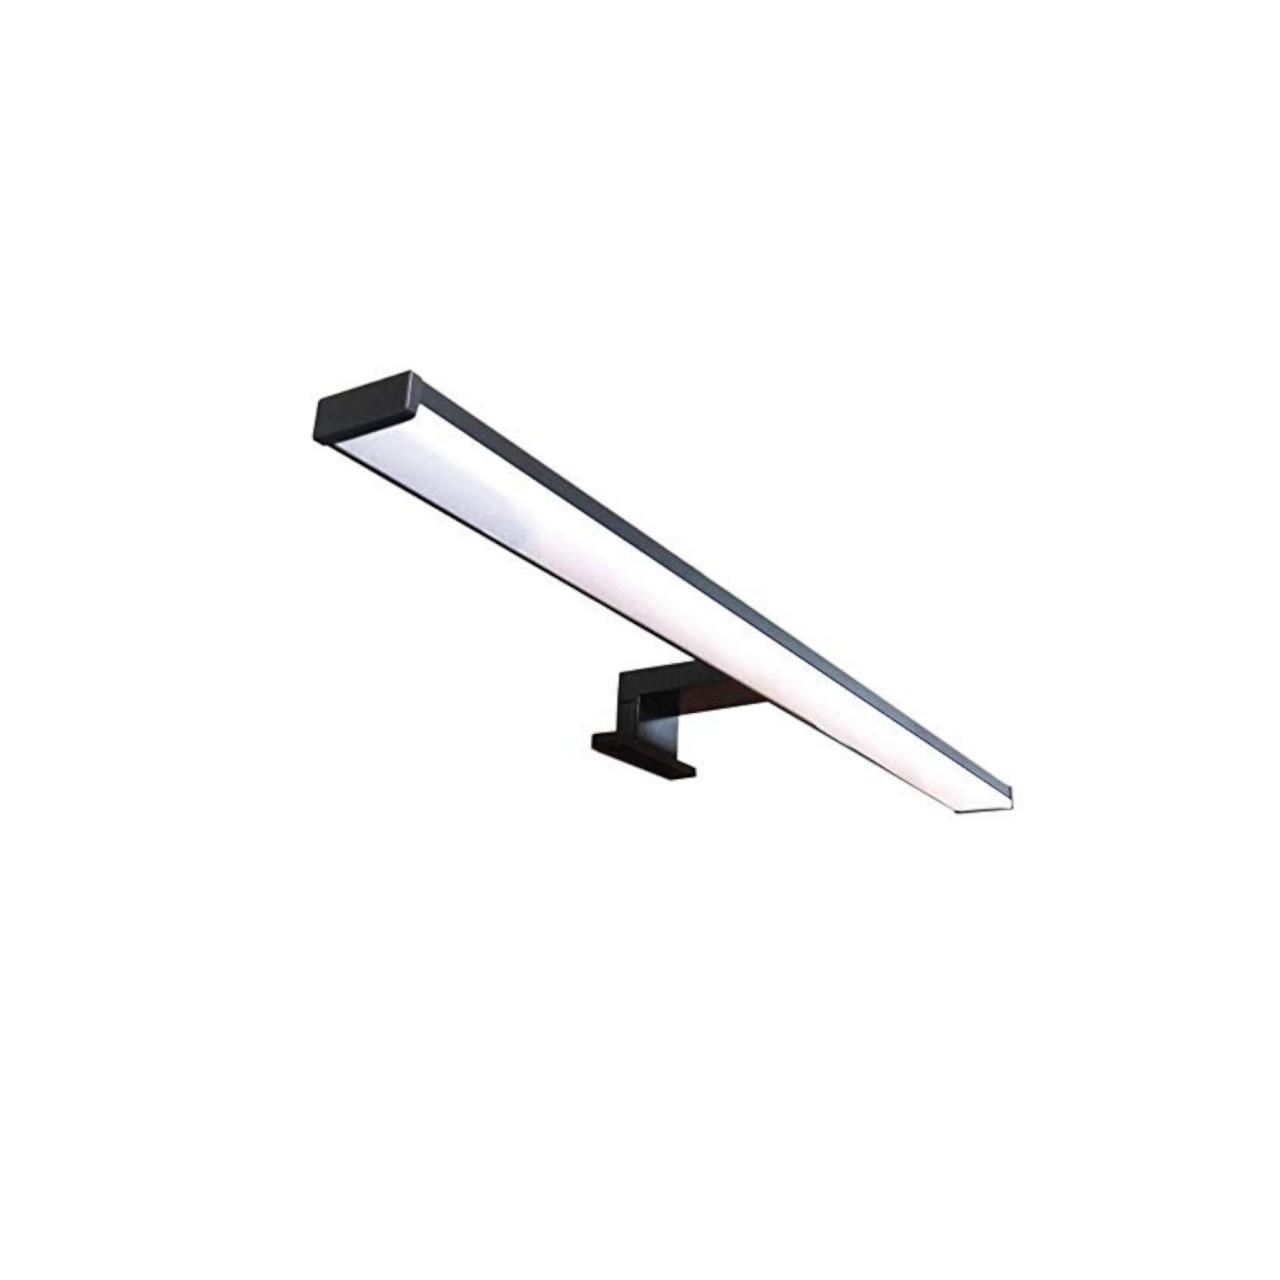 LAMPADA LED CM 60 ALLUMINIO NERO OPACO 4000 K